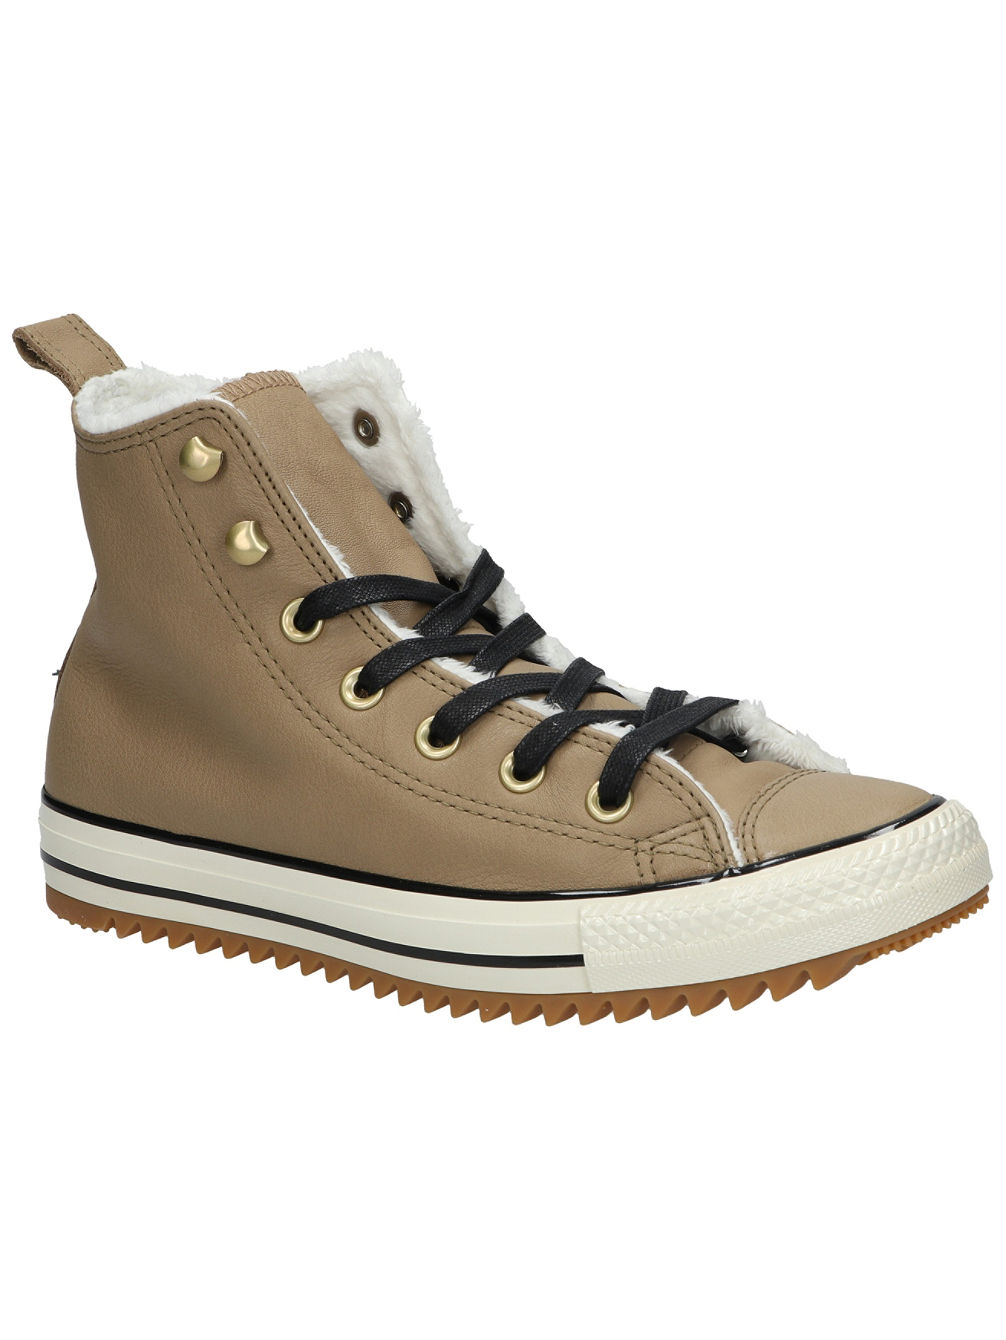 Buy Converse Chuck Taylor All Star Hiker Boots Women online at blue ... 0956e621517